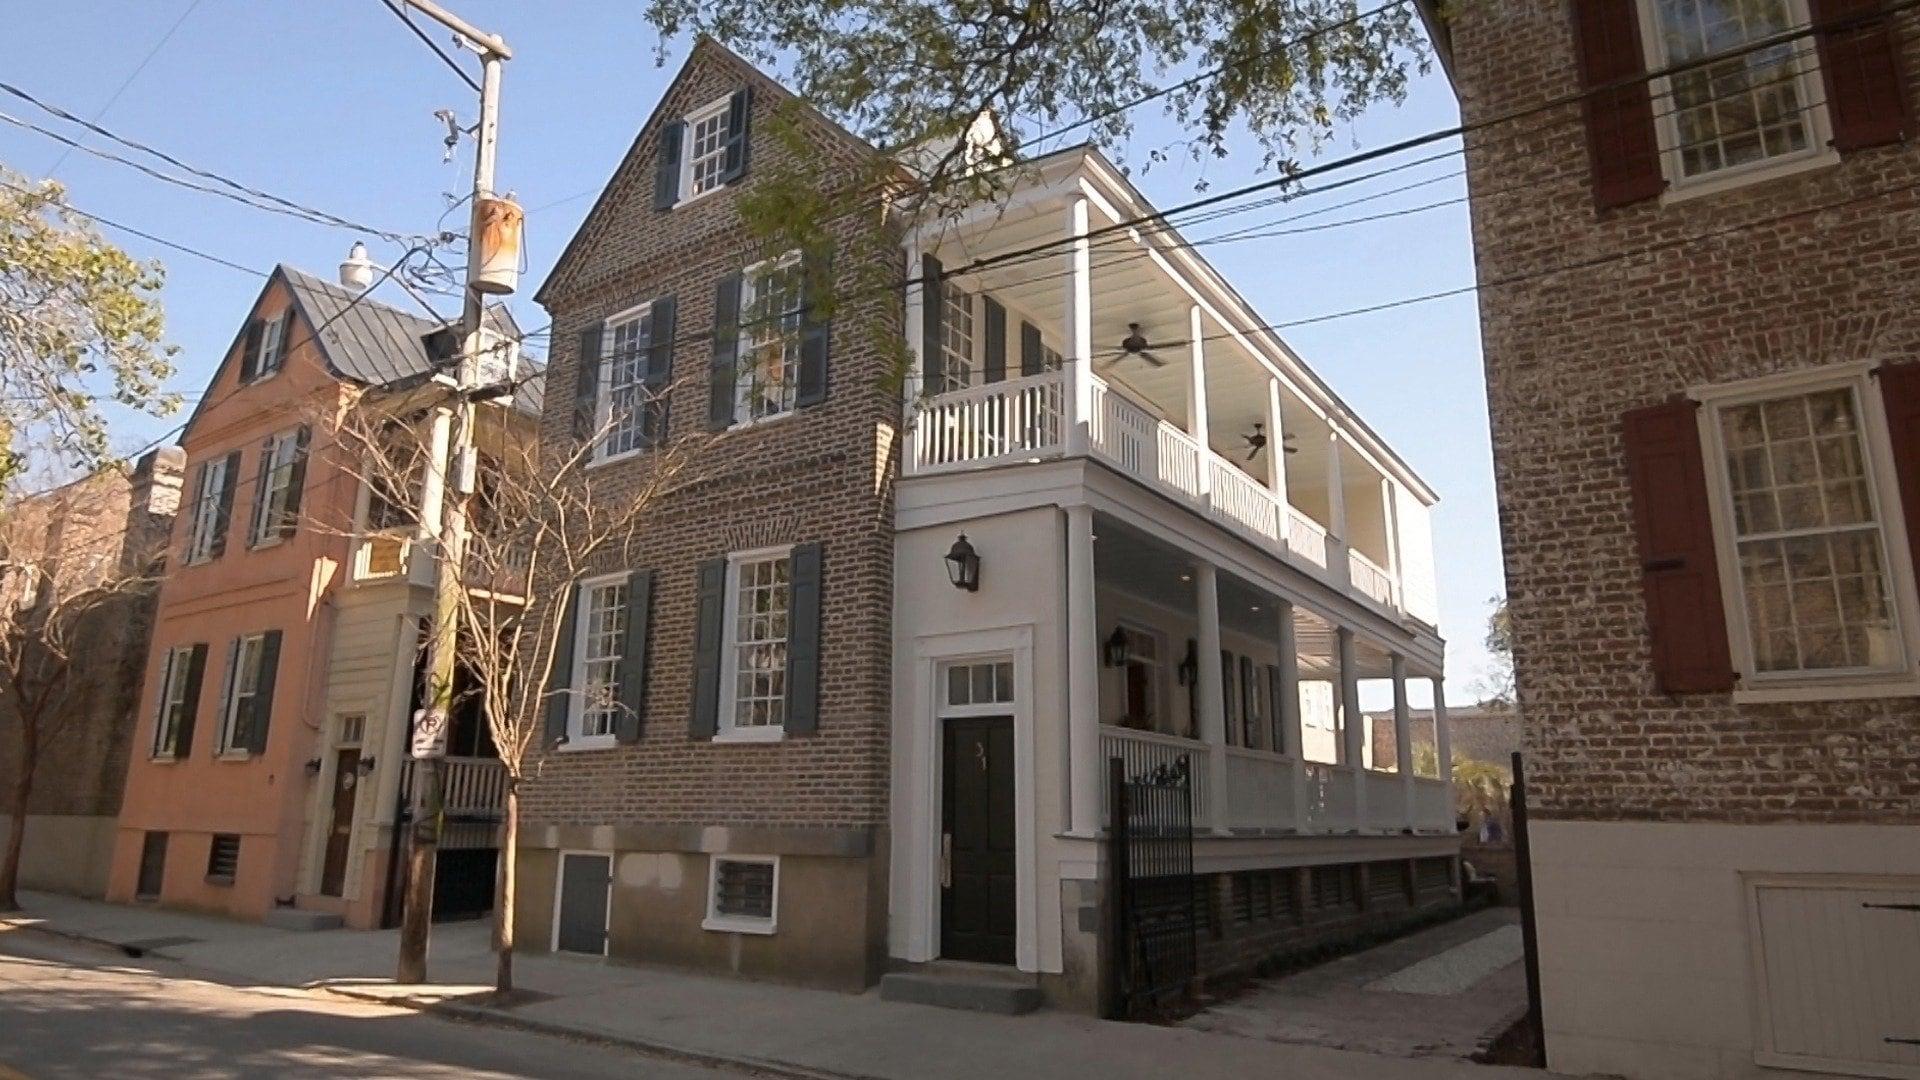 The Charleston Houses 2018: Singular Single House